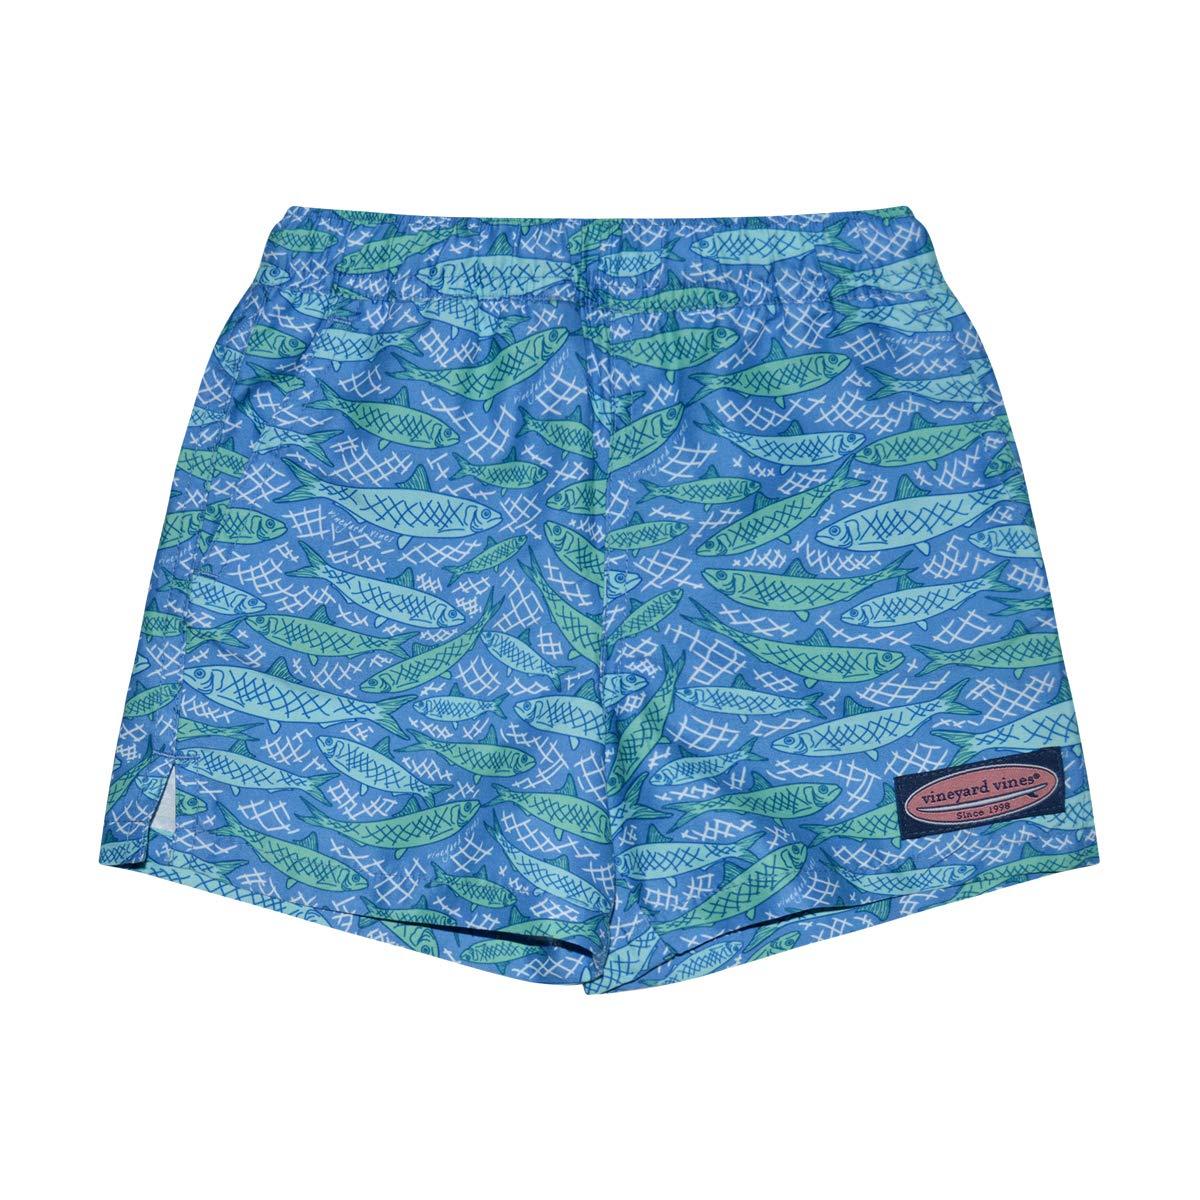 b50e20e5e6 Amazon.com: Vineyard Vines Boy's Chappy Swim Trunks: Clothing